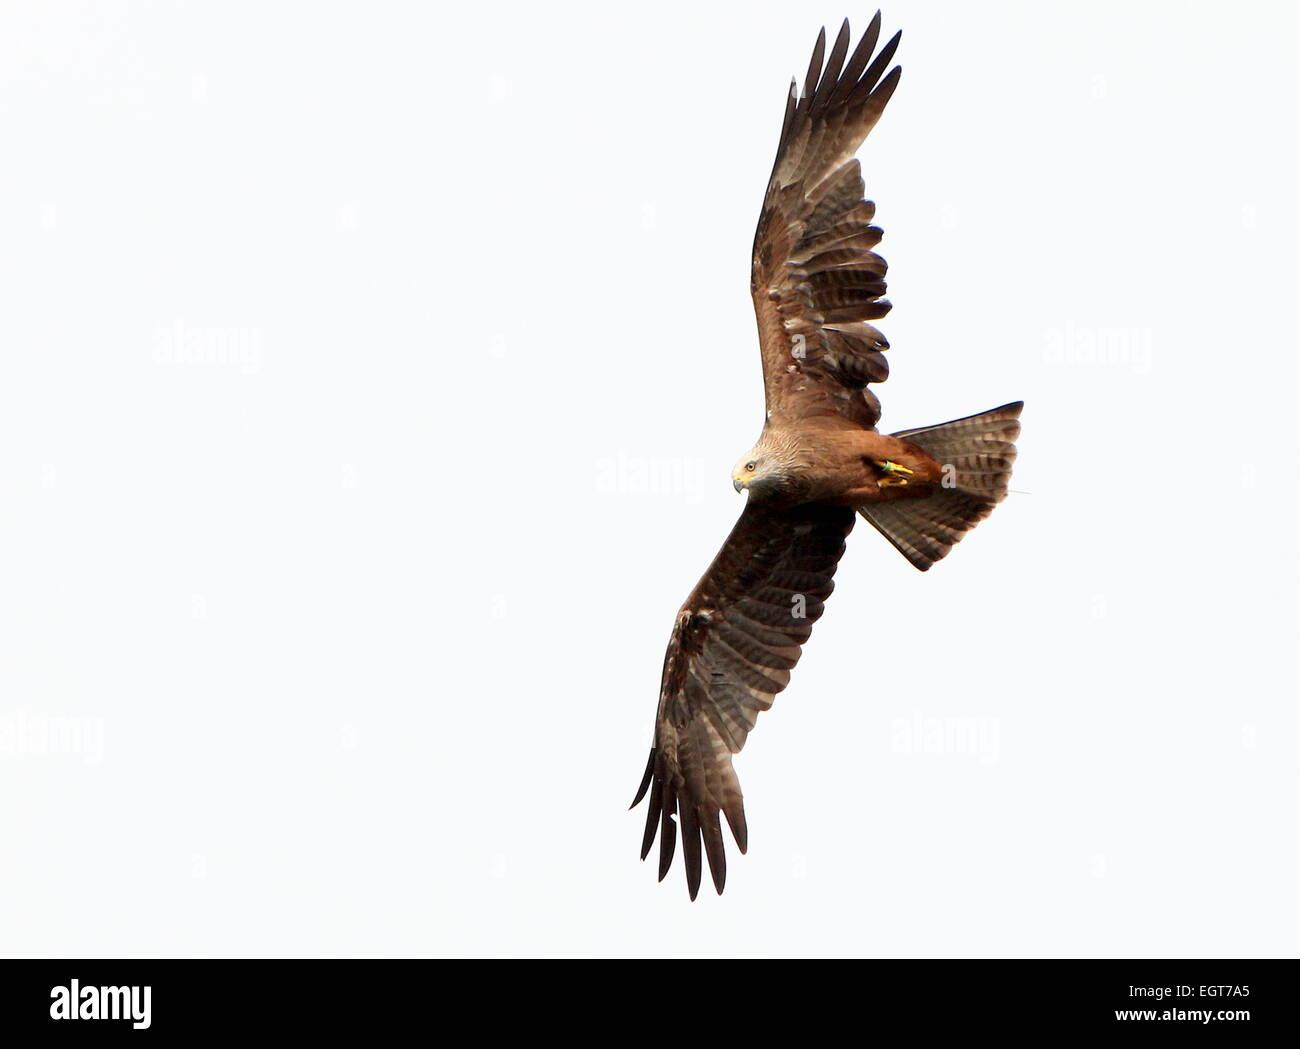 Eurasian Black Kite (Milvus migrans), detailed close-up in flight - Stock Image